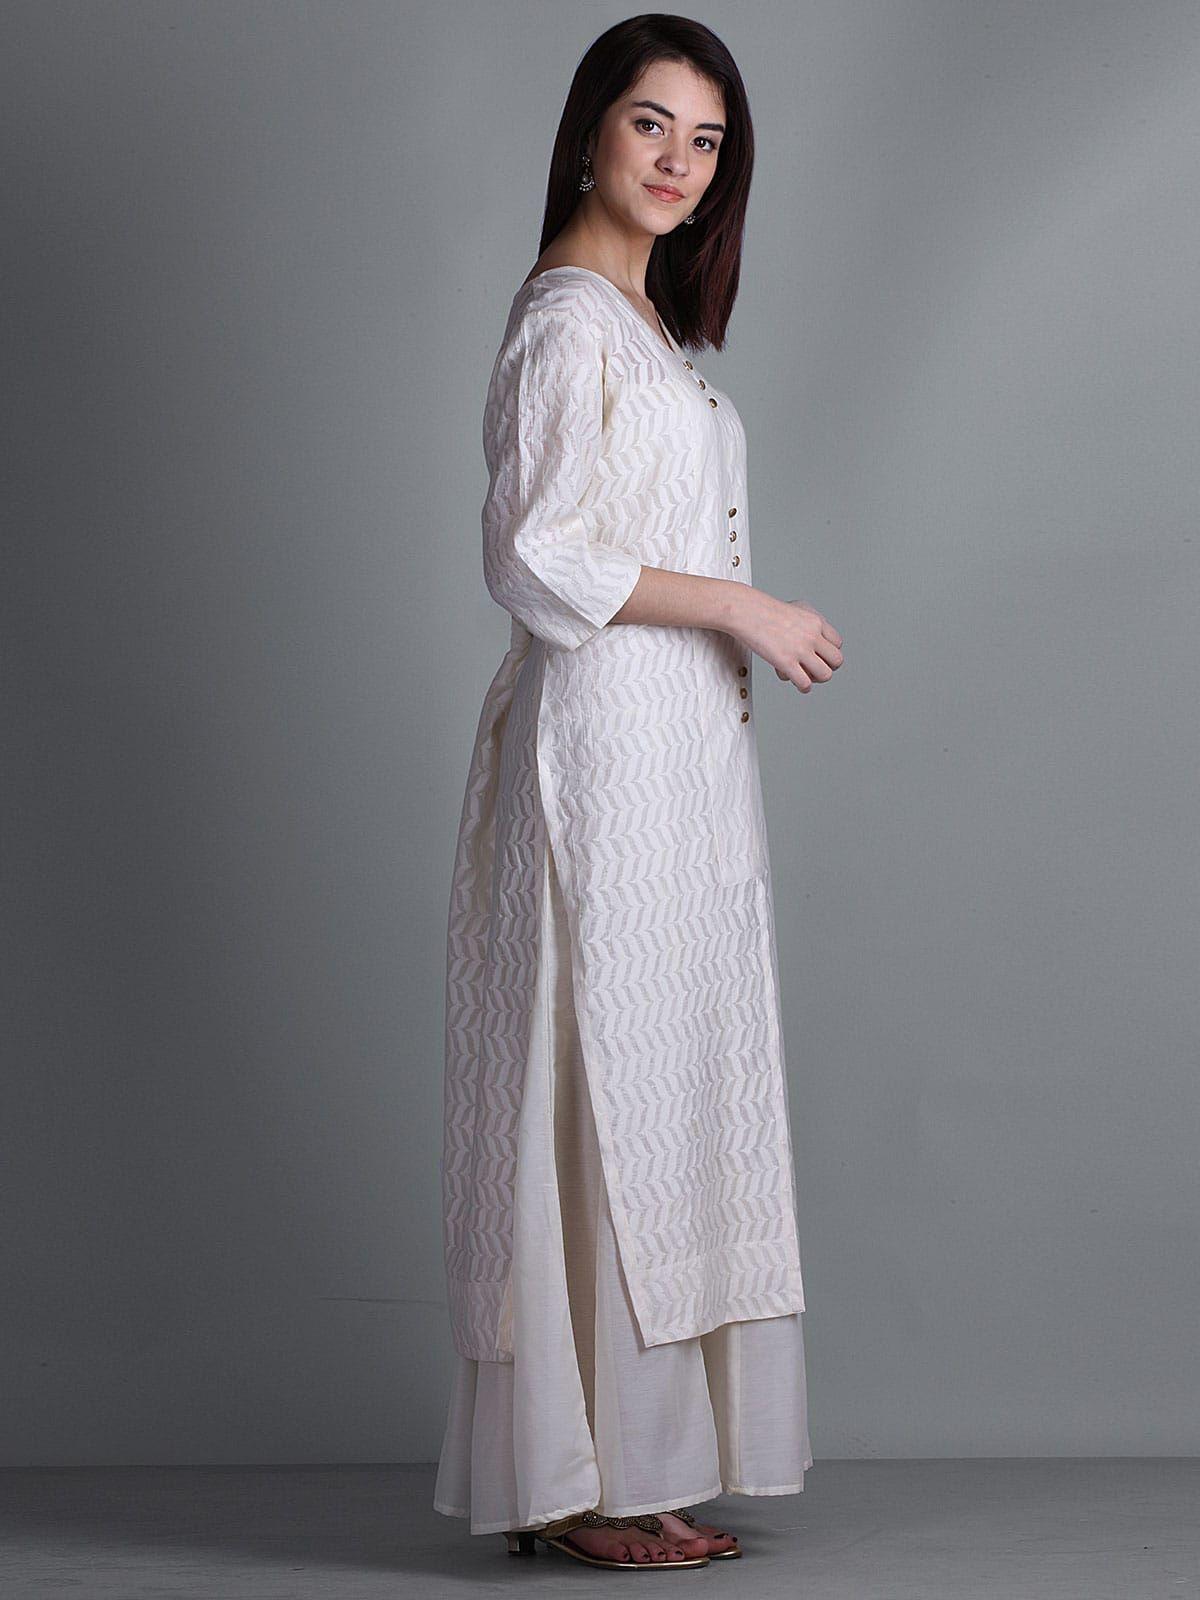 Off white th sleeves double layered kurta dresses pinterest